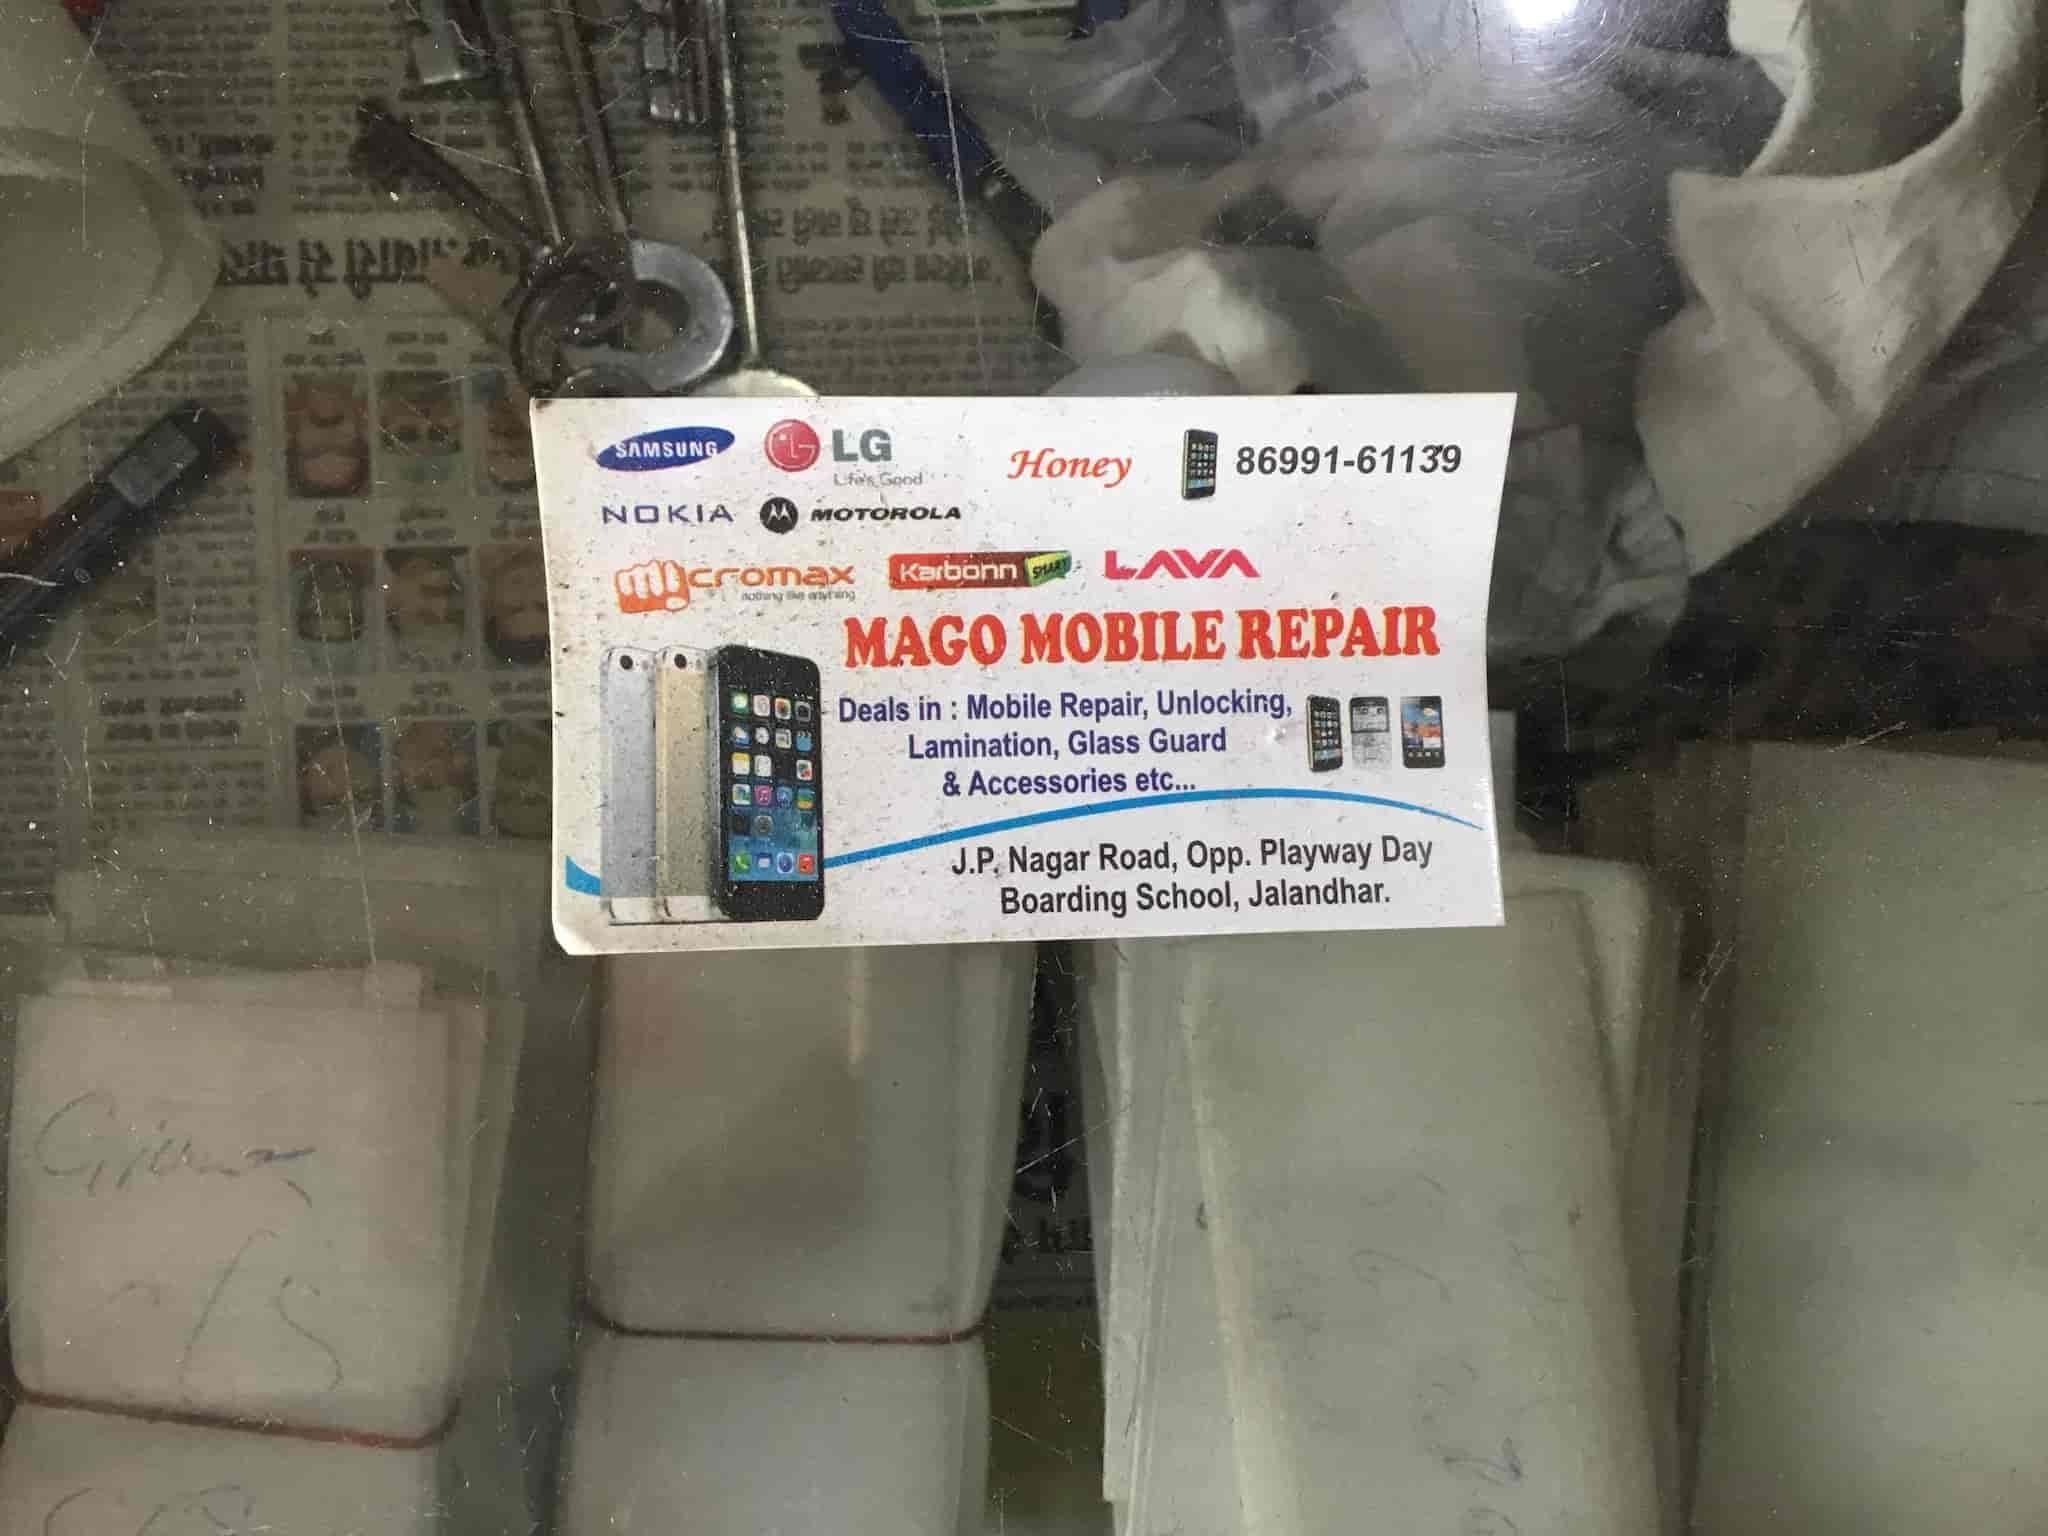 Mago Möbel mago mobile repair jalandhar city mobile phone dealers in